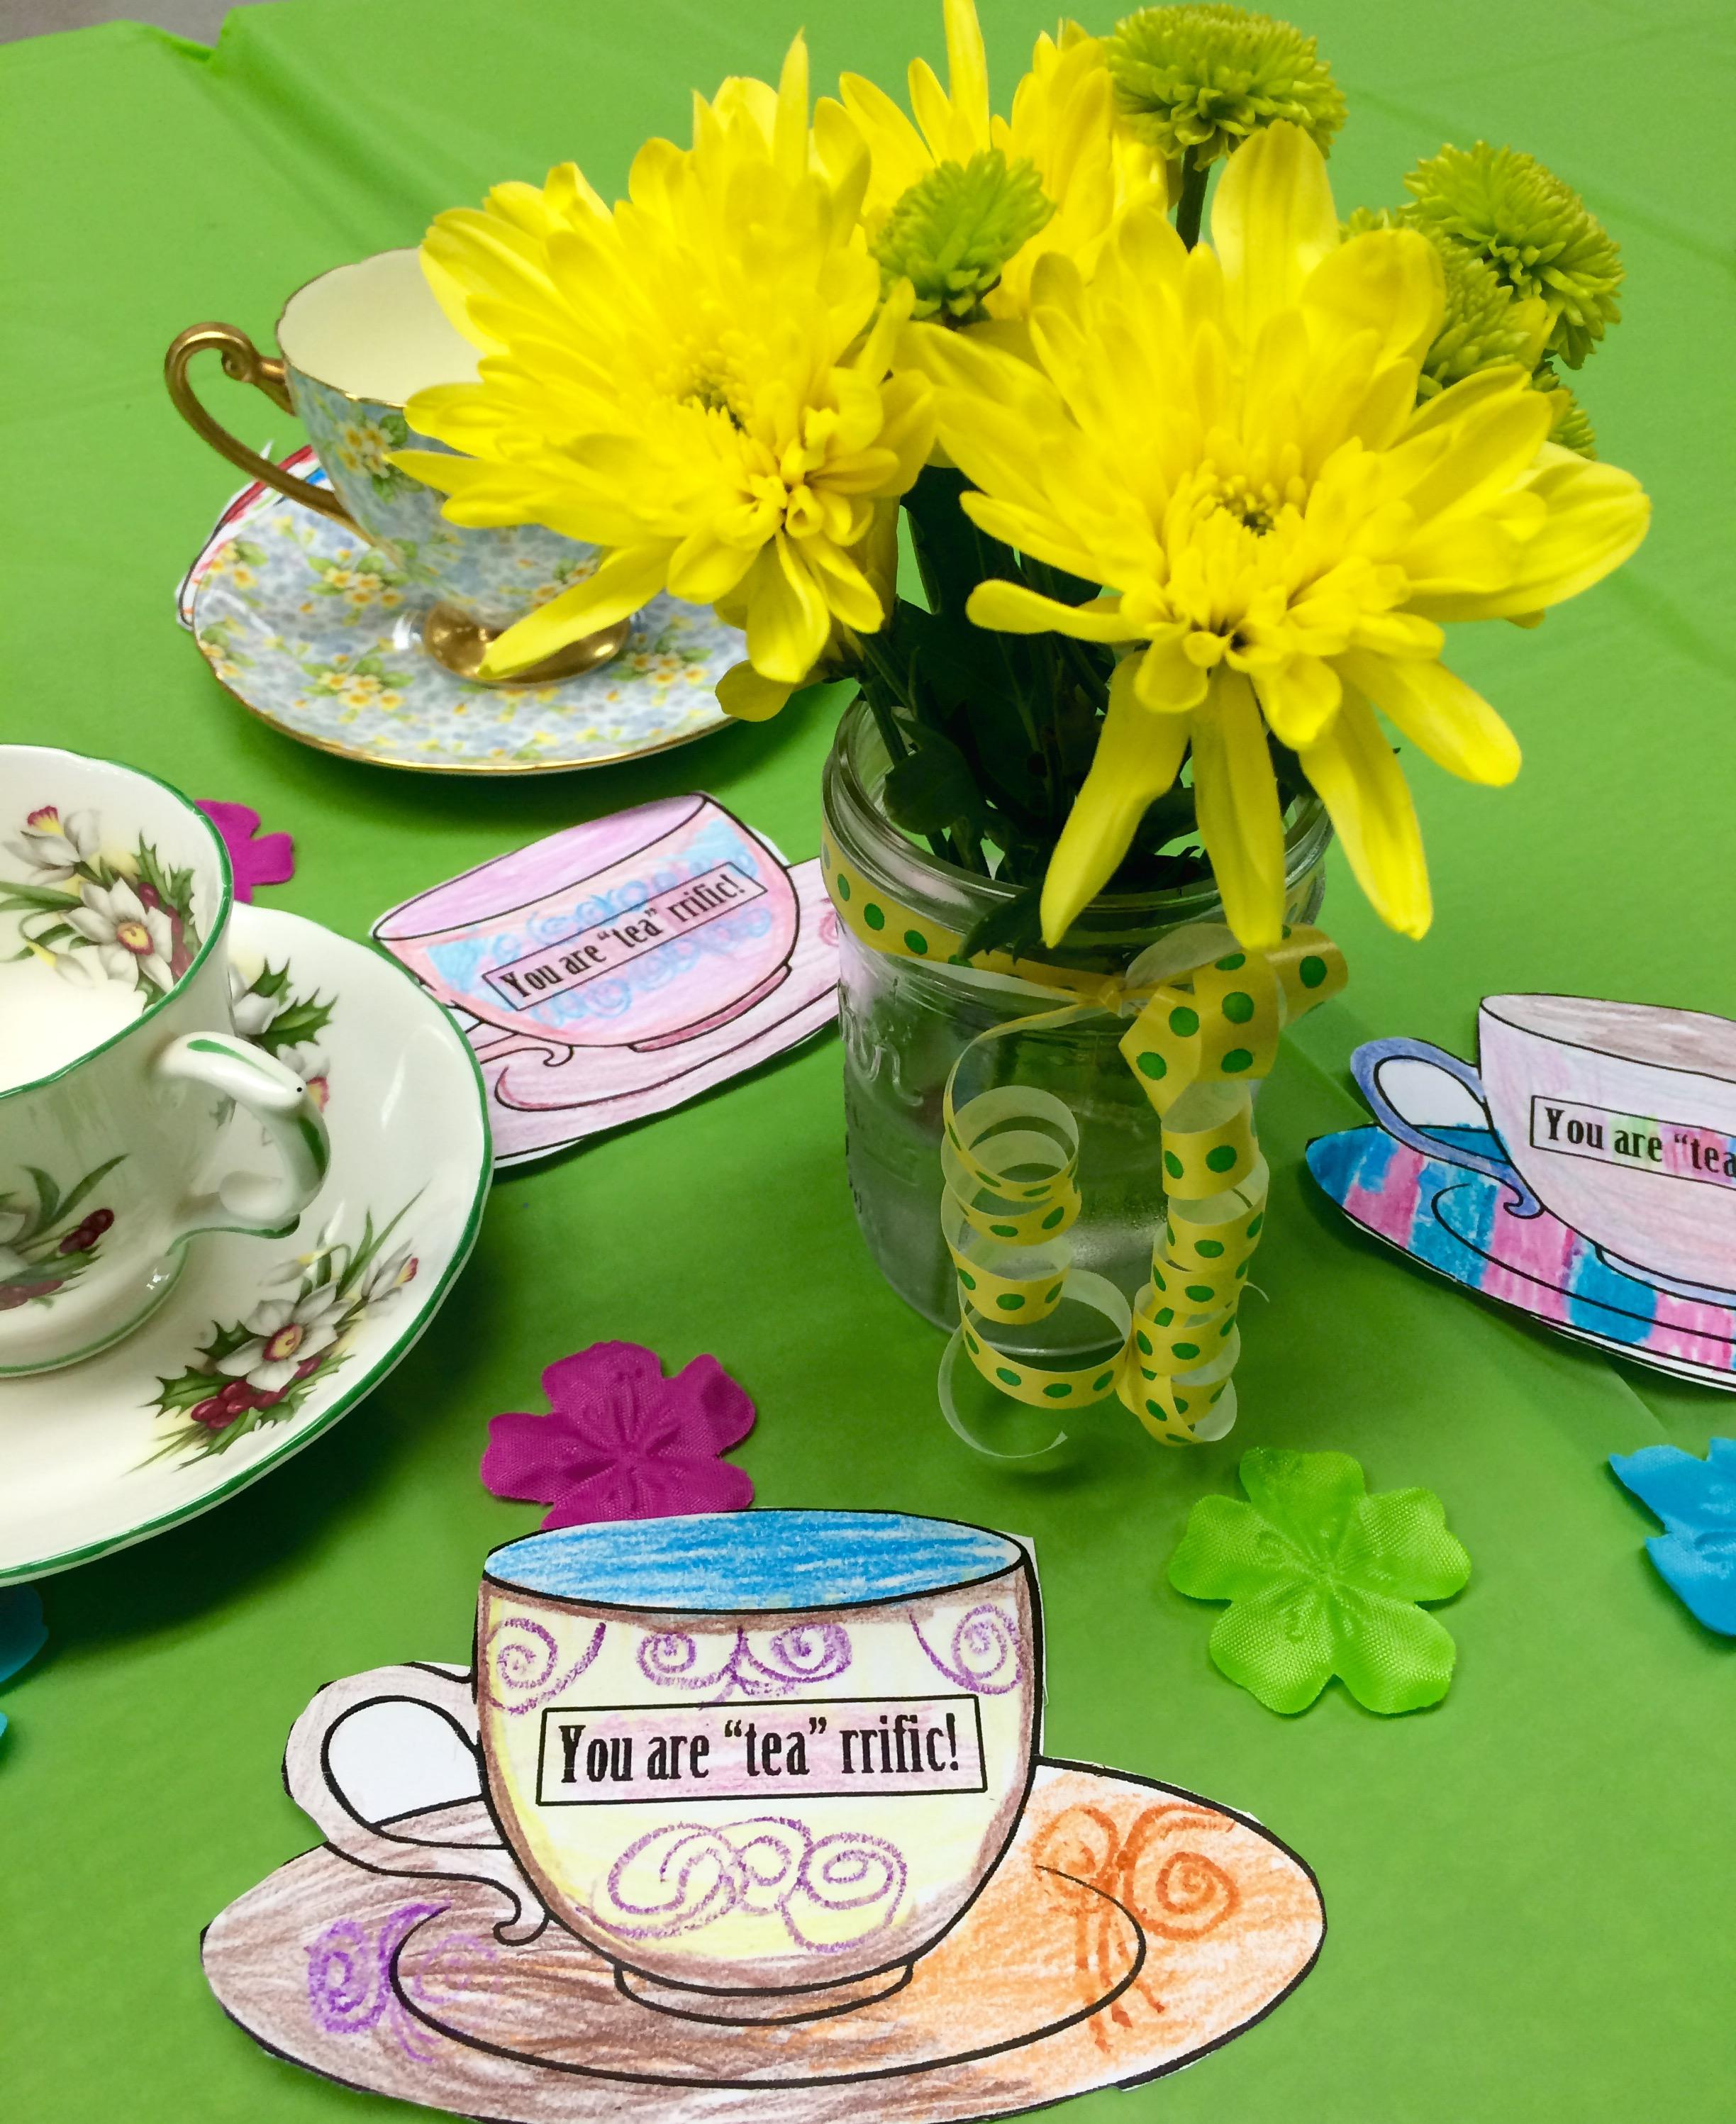 Tea-rriffic Tea Party